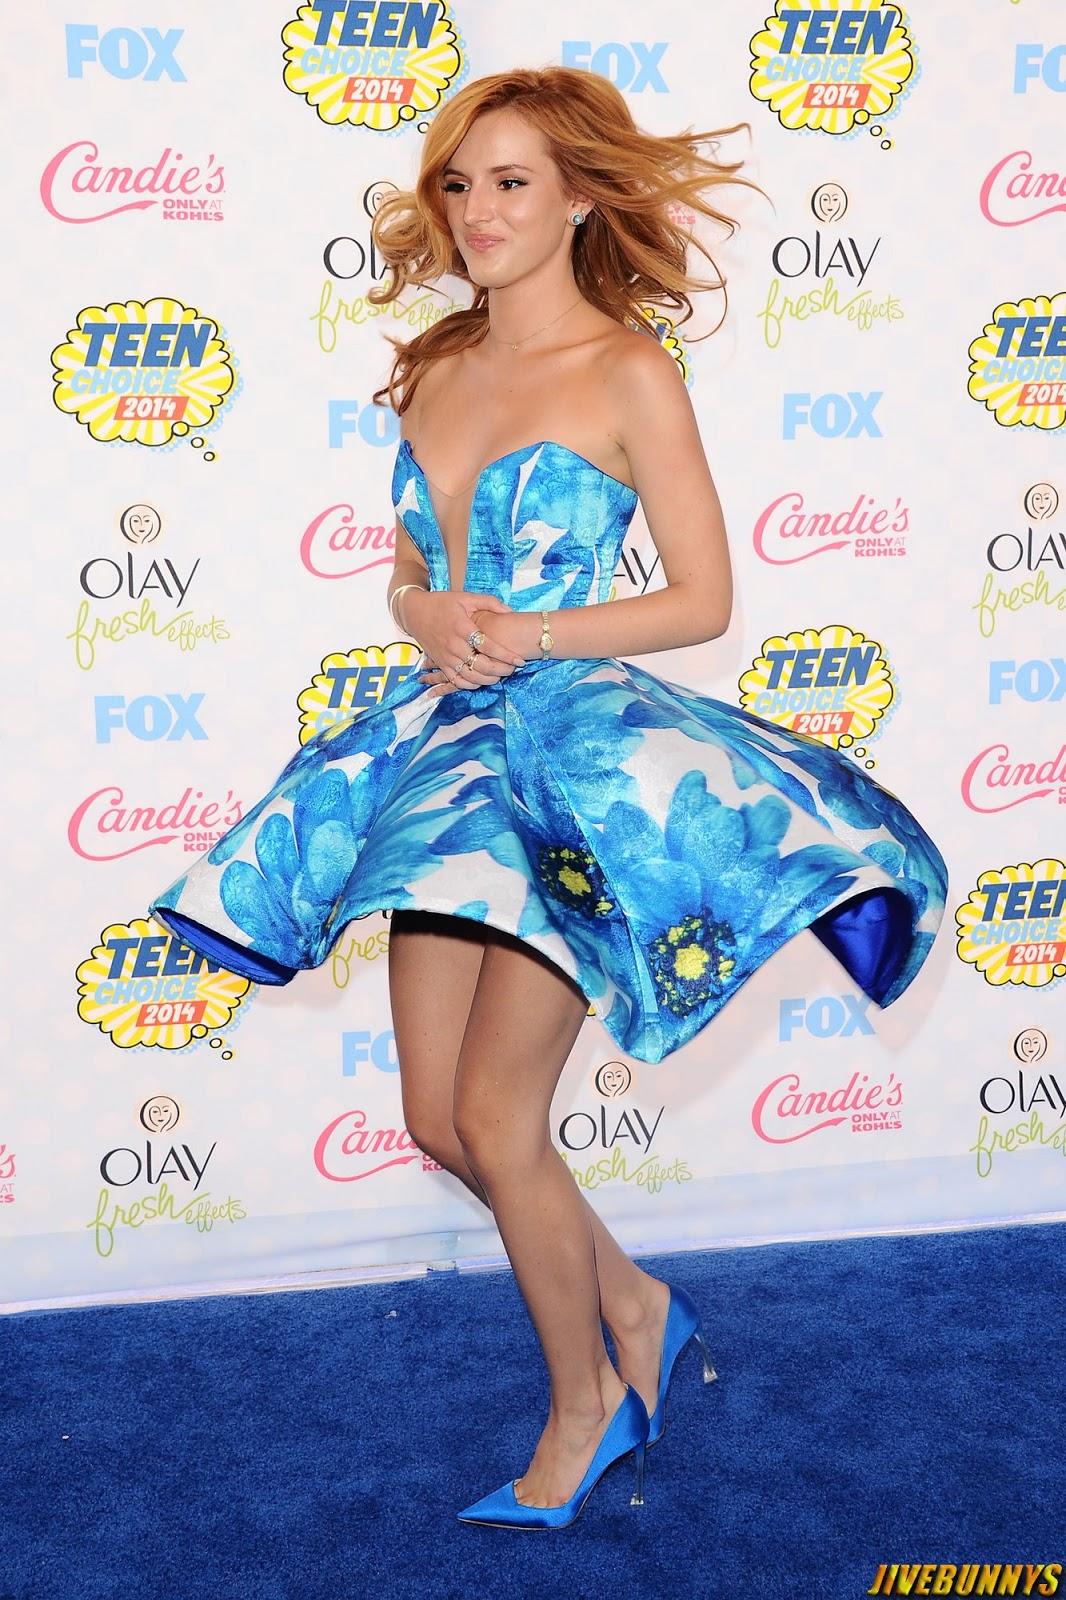 2014 Teen Choice Awards - Los Angeles - August 10, 2014